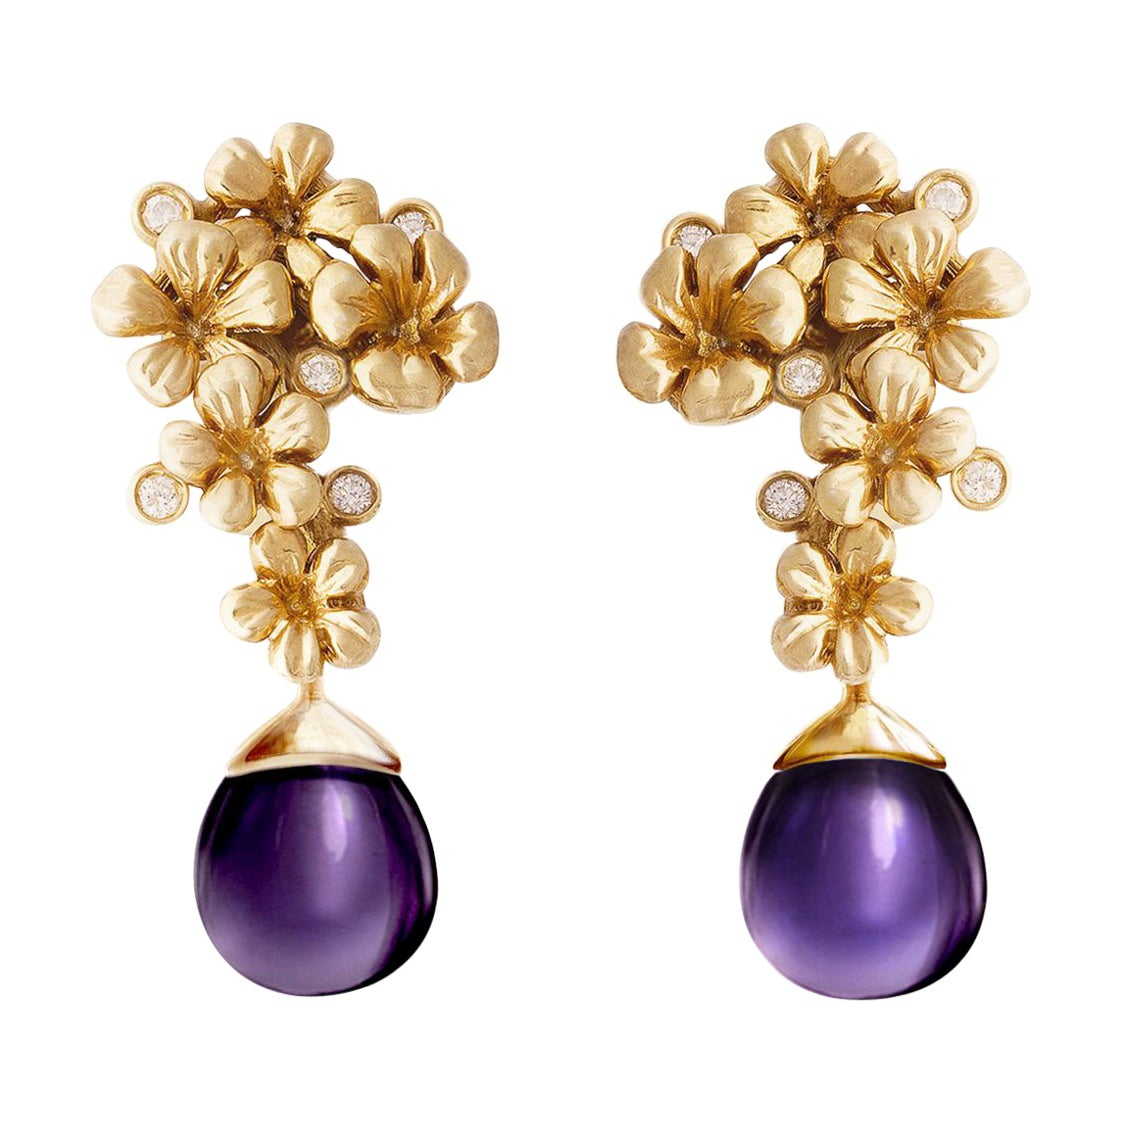 18 Karat Gold Modern Plum Blossom Cocktail Clip-On Earrings with Diamonds